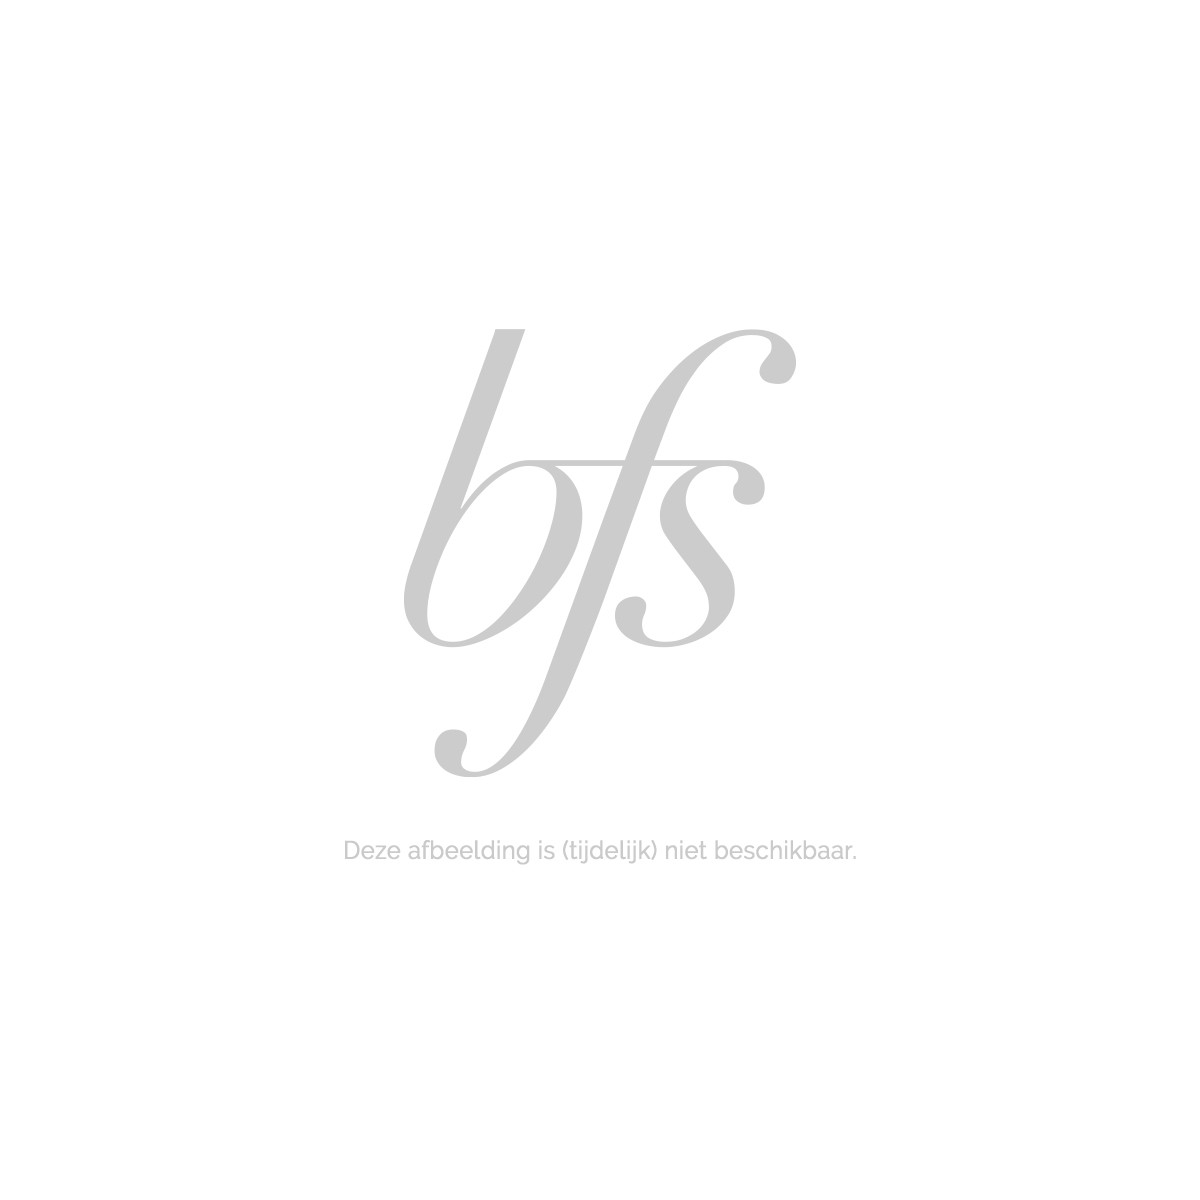 Pupa Nail Lasting Color 309 Fluo Fuchsia